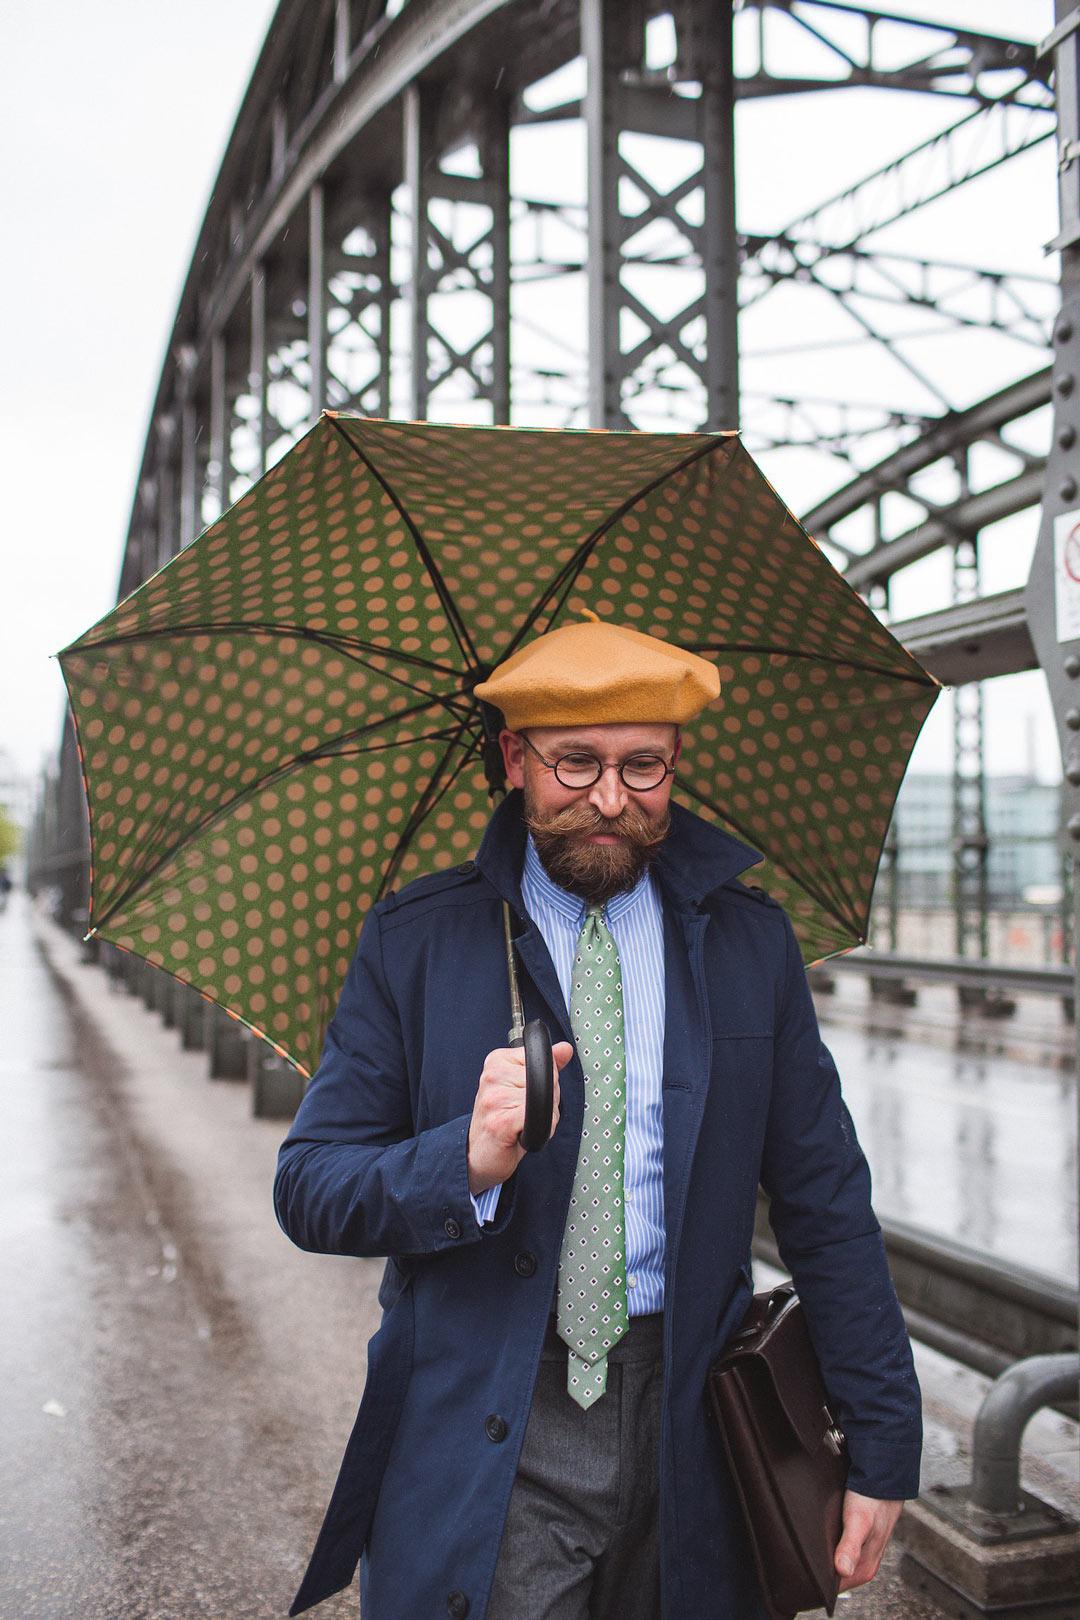 Why do I love to carry an umbrella?